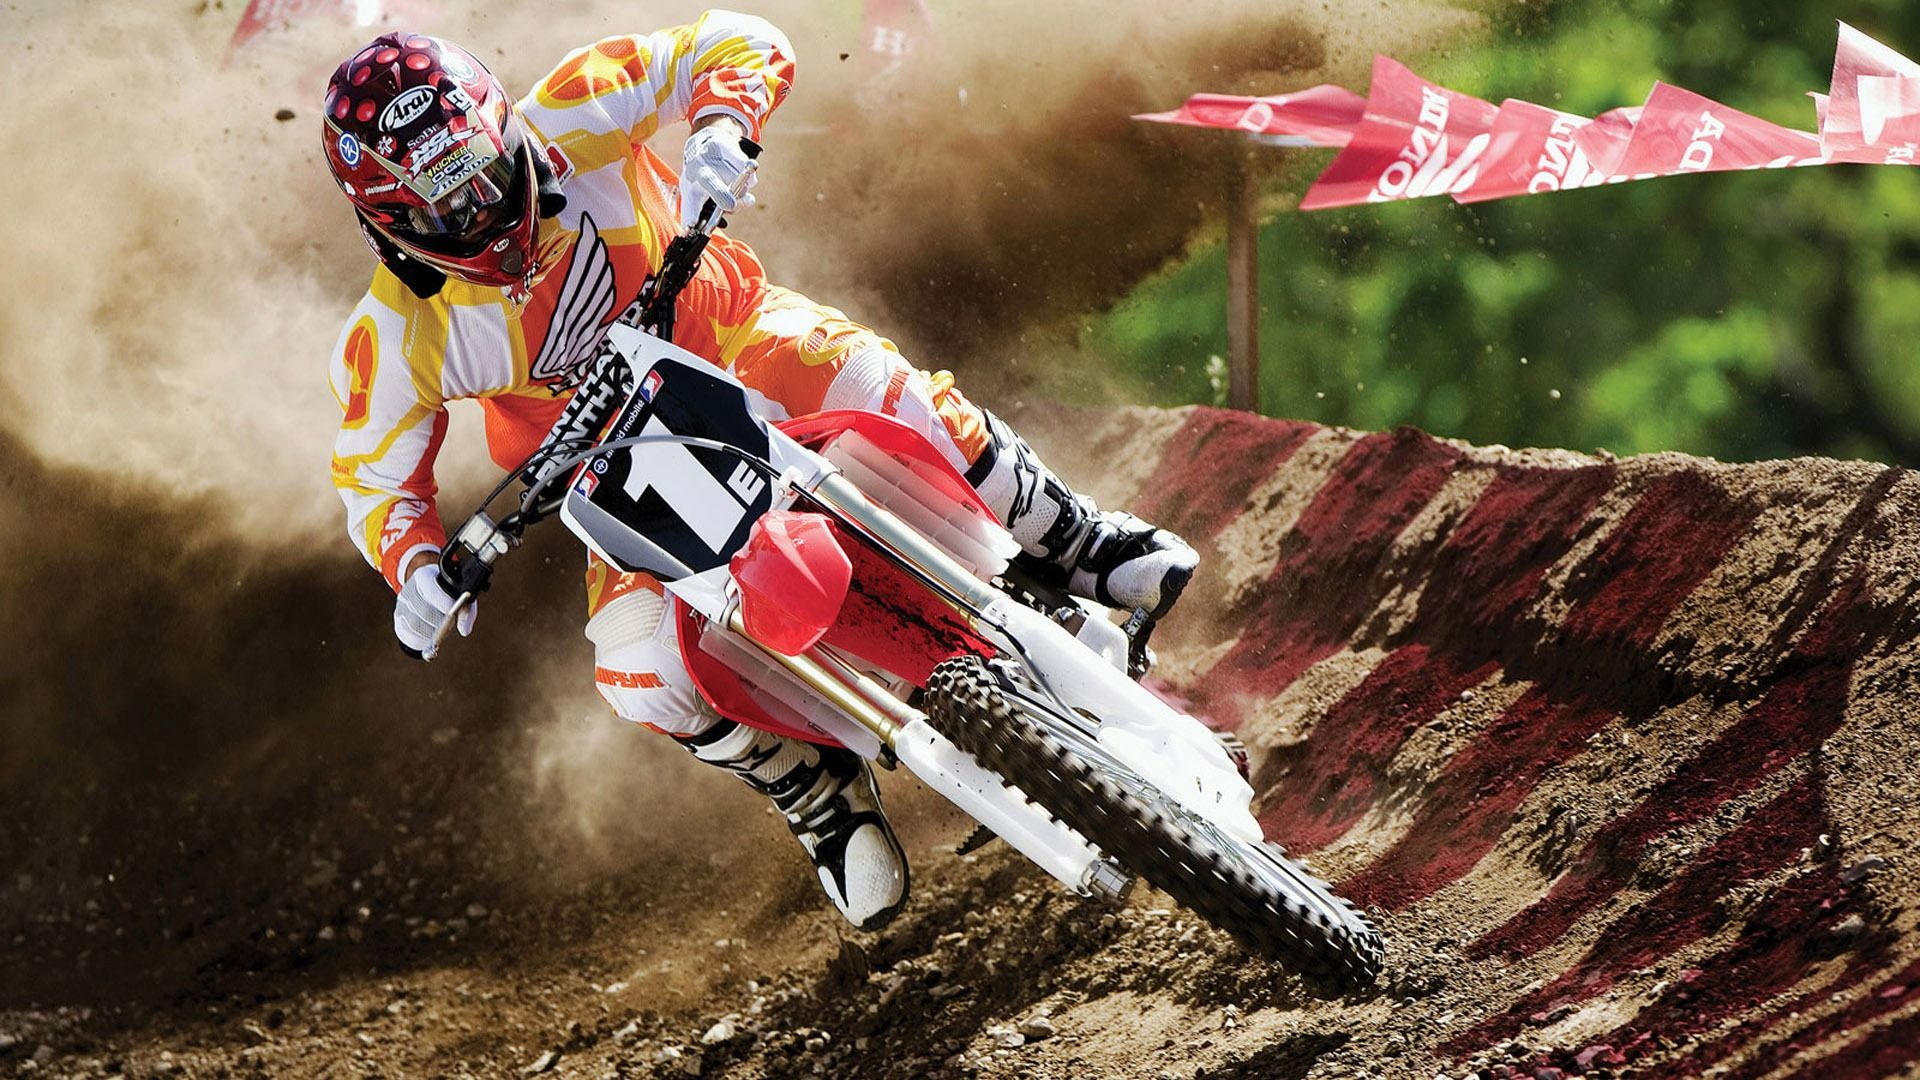 Off Road Moto Racing 1080p HD Sports Wallpaper Projects